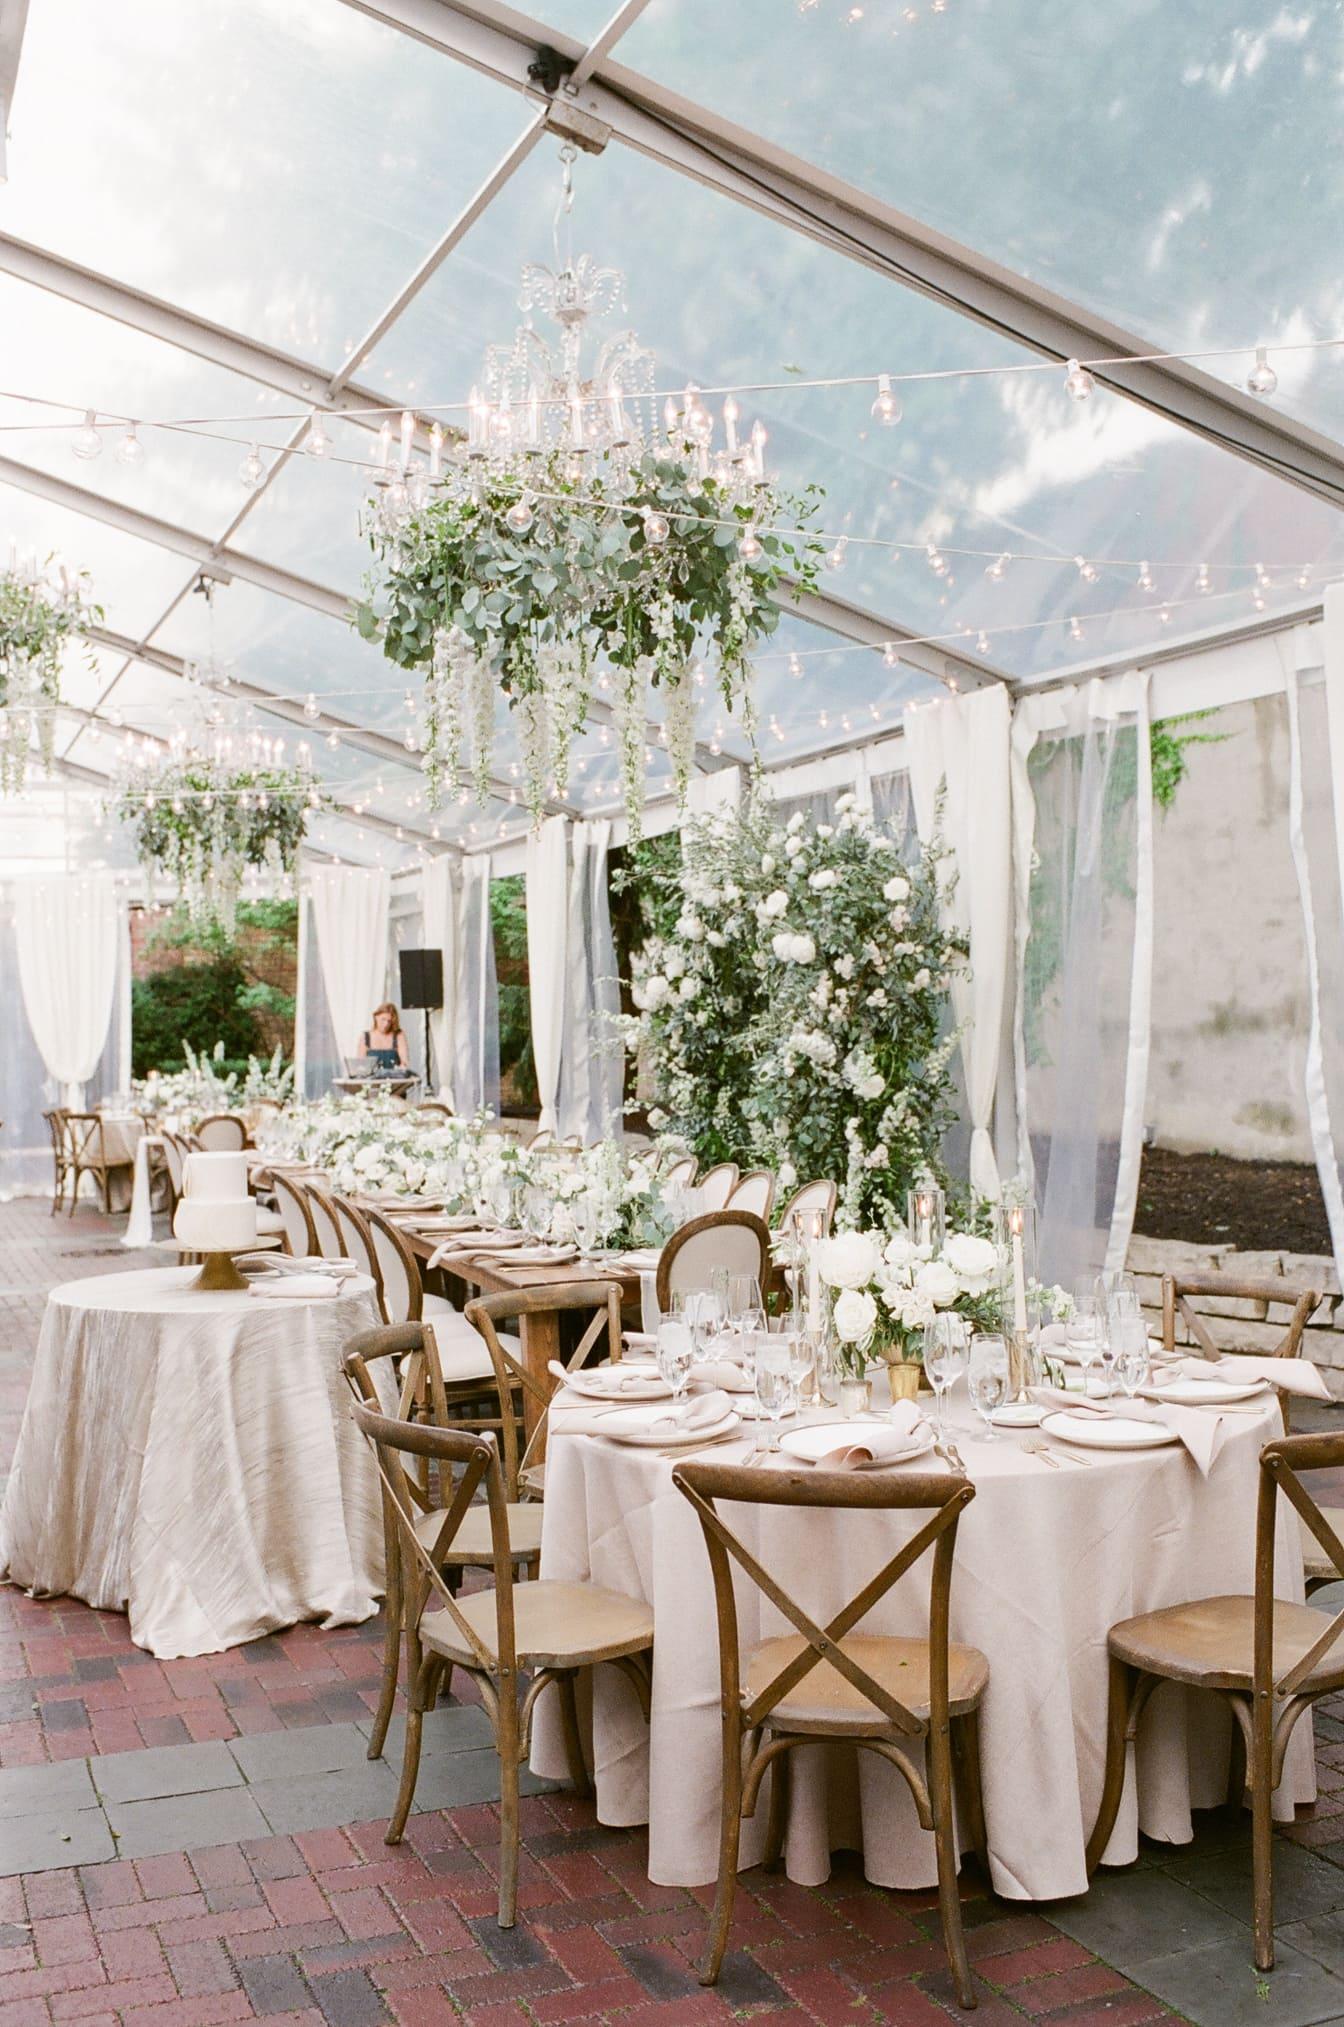 Tent wedding reception decor at Chicago Illuminating Company Wedding